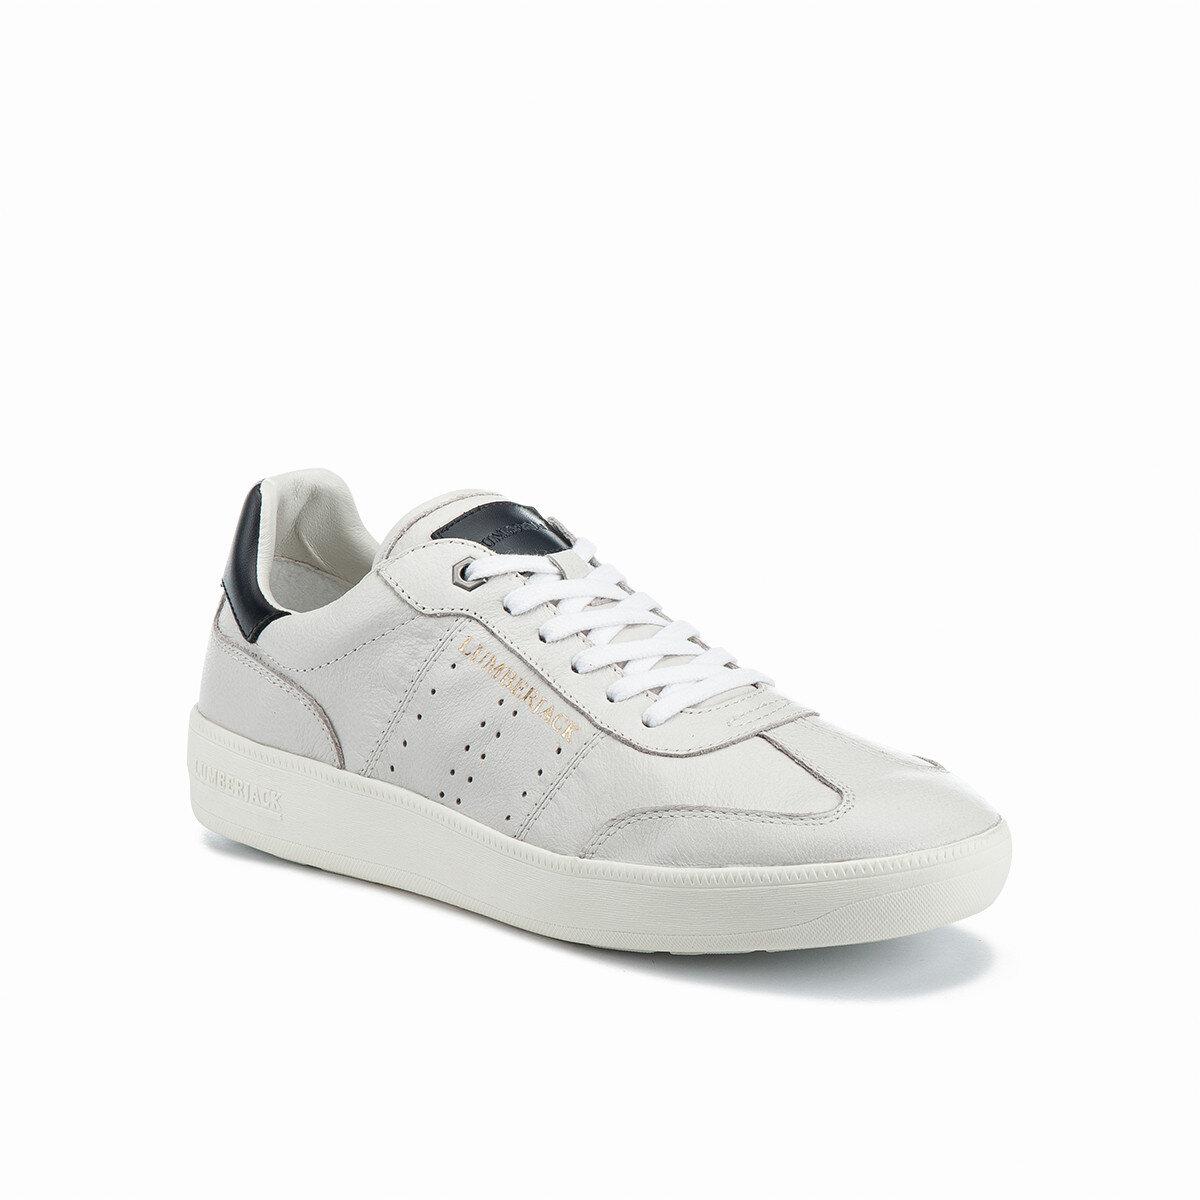 SUMMER CHUCK Sneakers Uomo